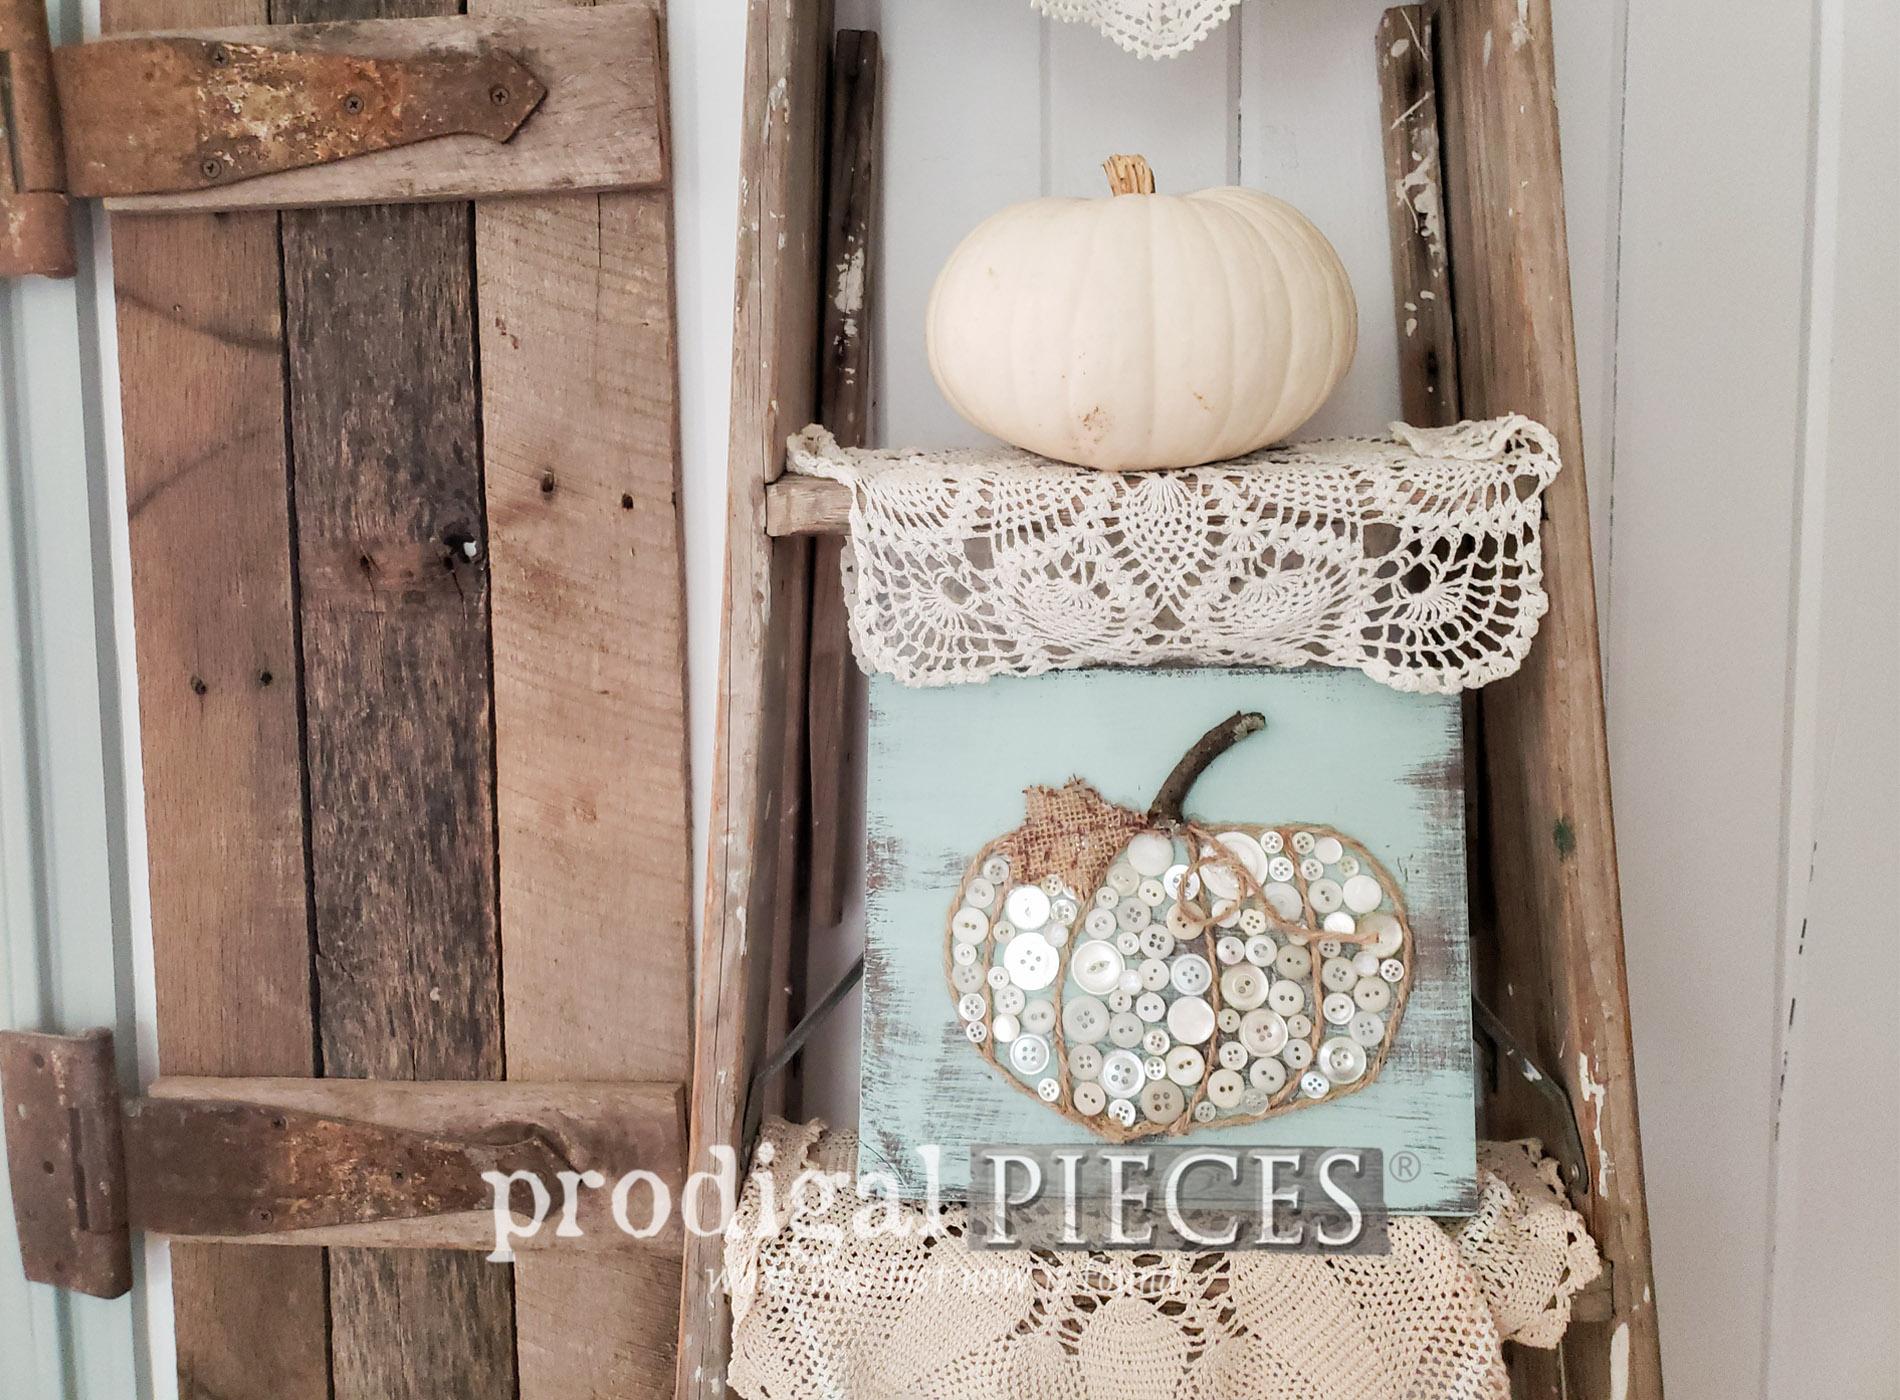 Featured Fall Button Pumpkin Art for Prodigal Pieces Kids CREATE at prodigalpieces.com #prodigalpieces #crafts #diy #fall #home #homedecor #farmhouse